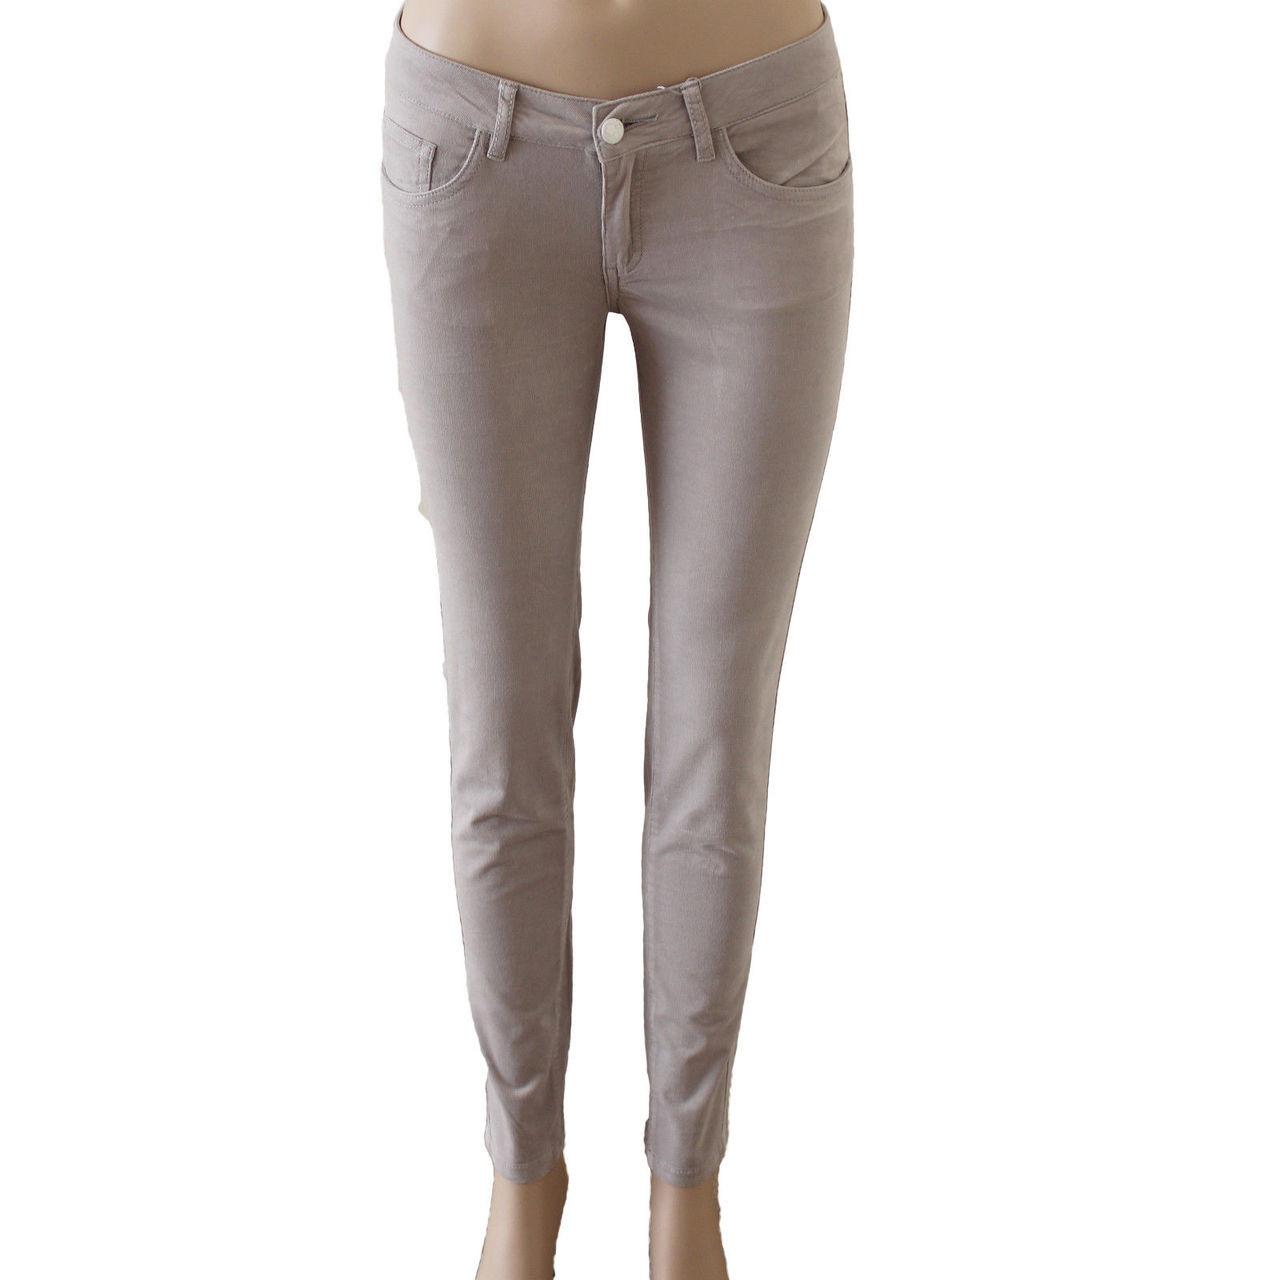 2fb05426e5f Womens Corduroy Pants Stretch Skinny Grey